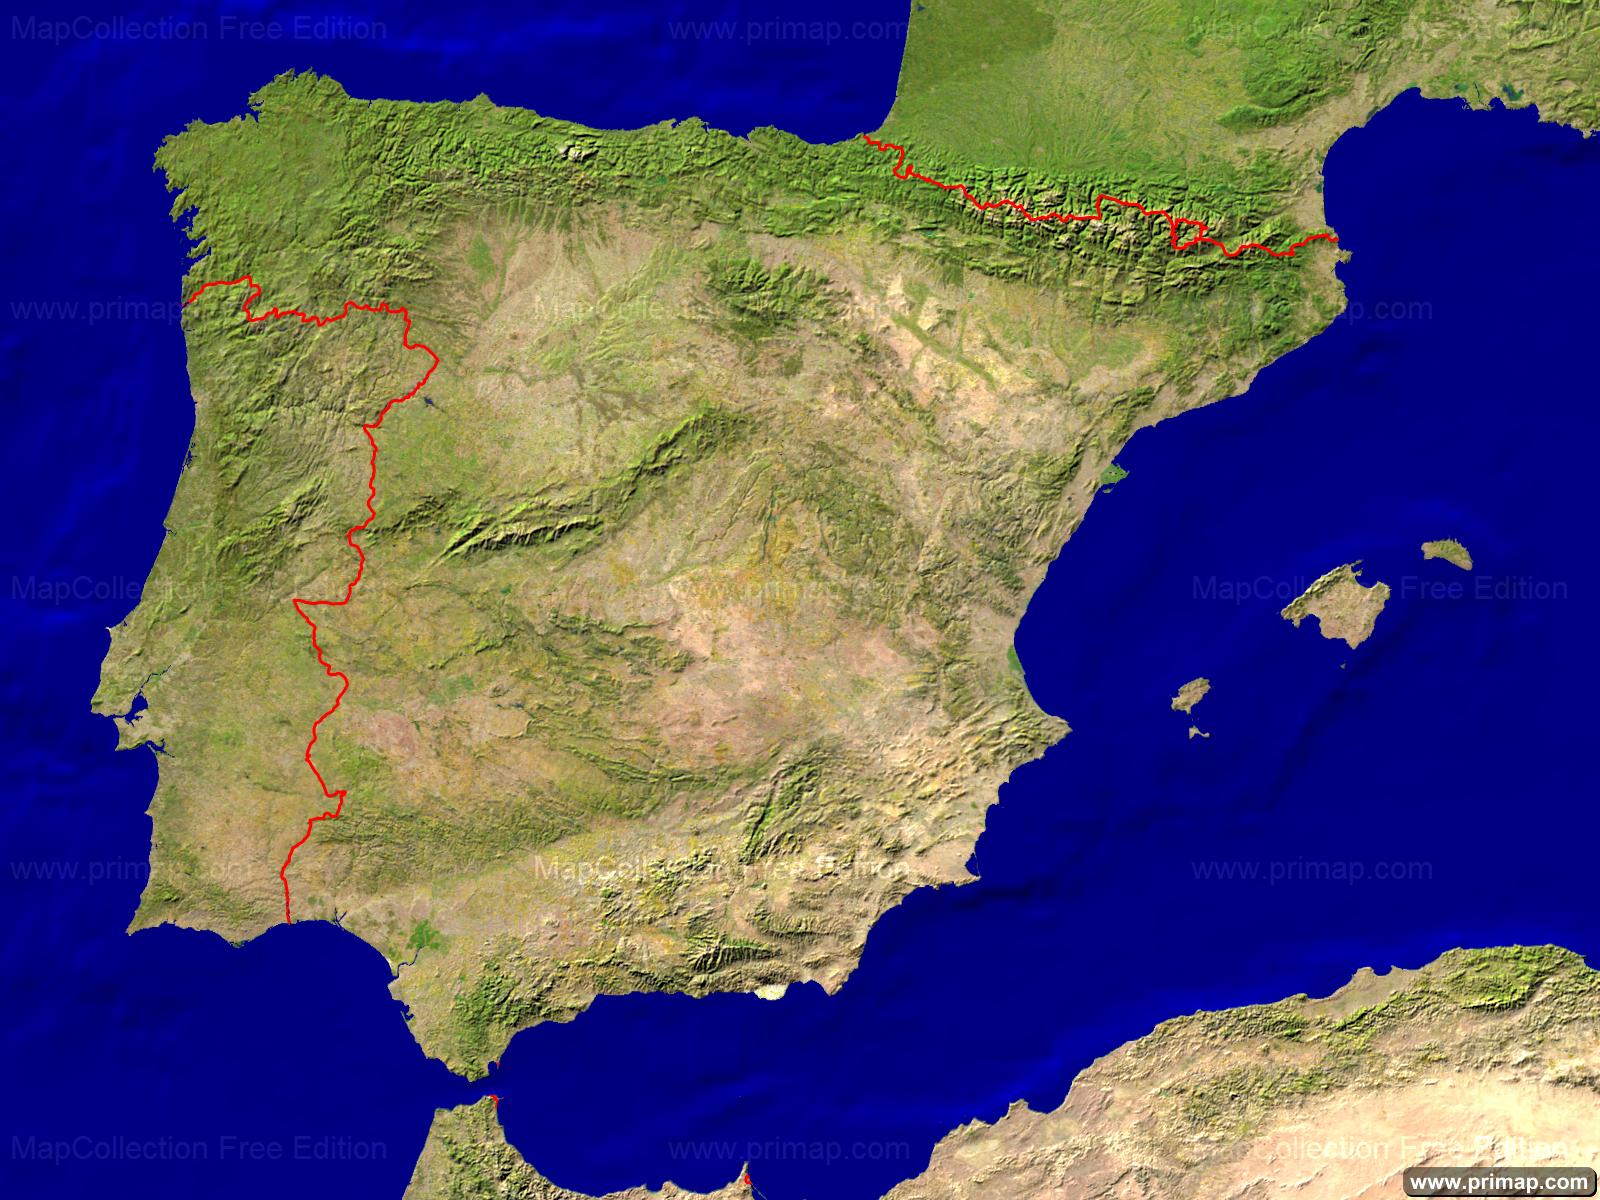 Satellite Map Of Spain.Primap National Maps